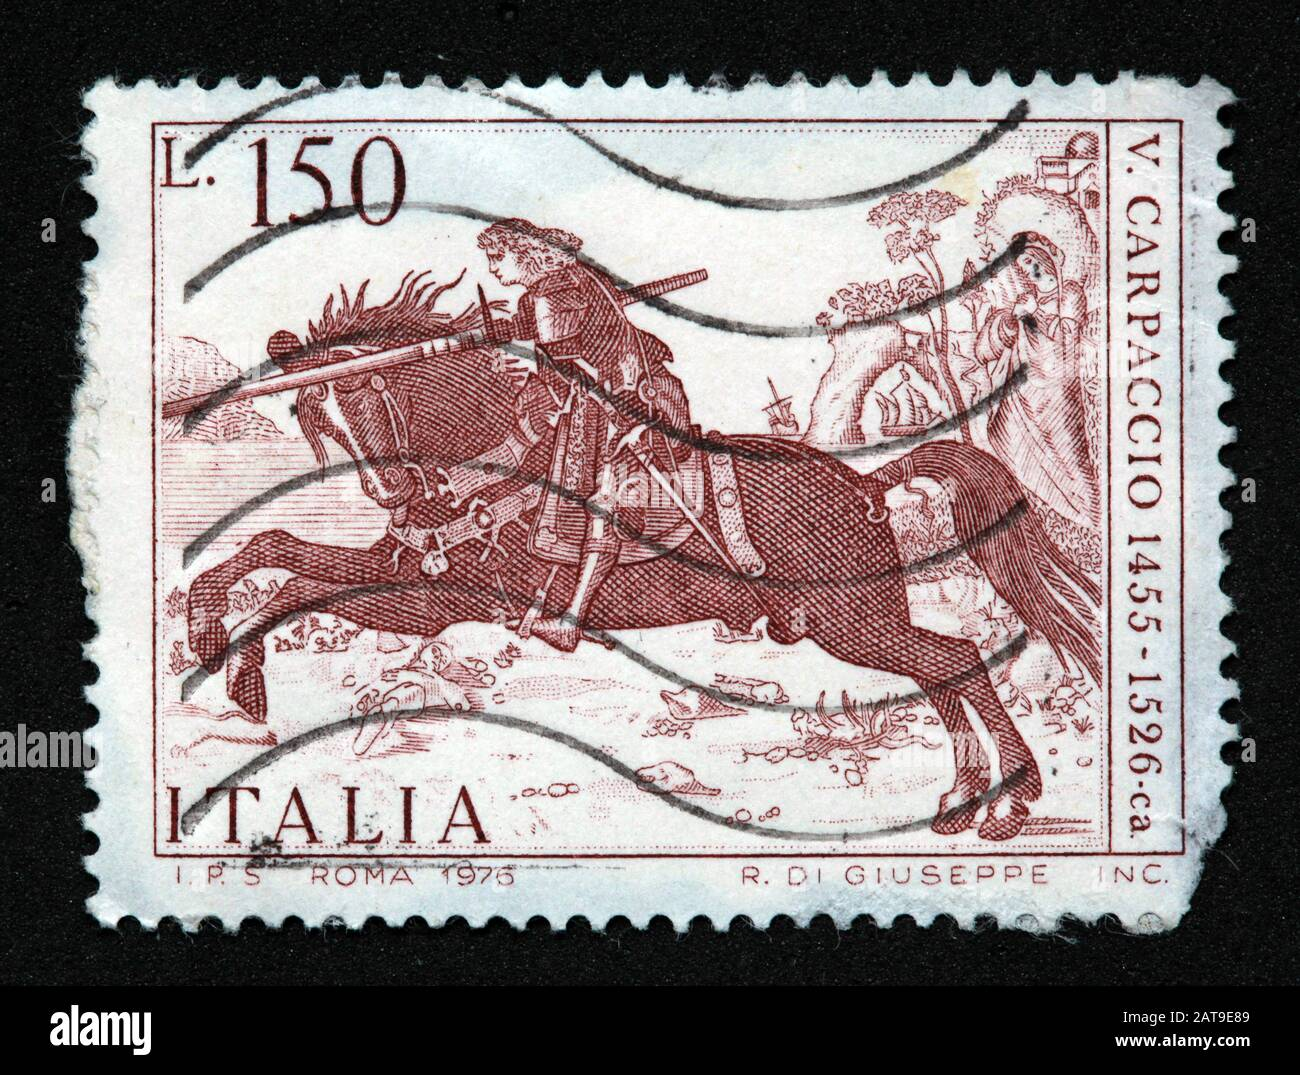 Hotpixuk,@Hotpixuk,GoTonySmith,stamp,postal,franked,frank,used stamps,used franked,used,franked stamp,from envelope,history,historic,old,Italy,Italian,Italia,Italy Stamp,italian stamp,franked Italian stamp,used Italian stamp,Italy stamp,Roma,150lire,150L